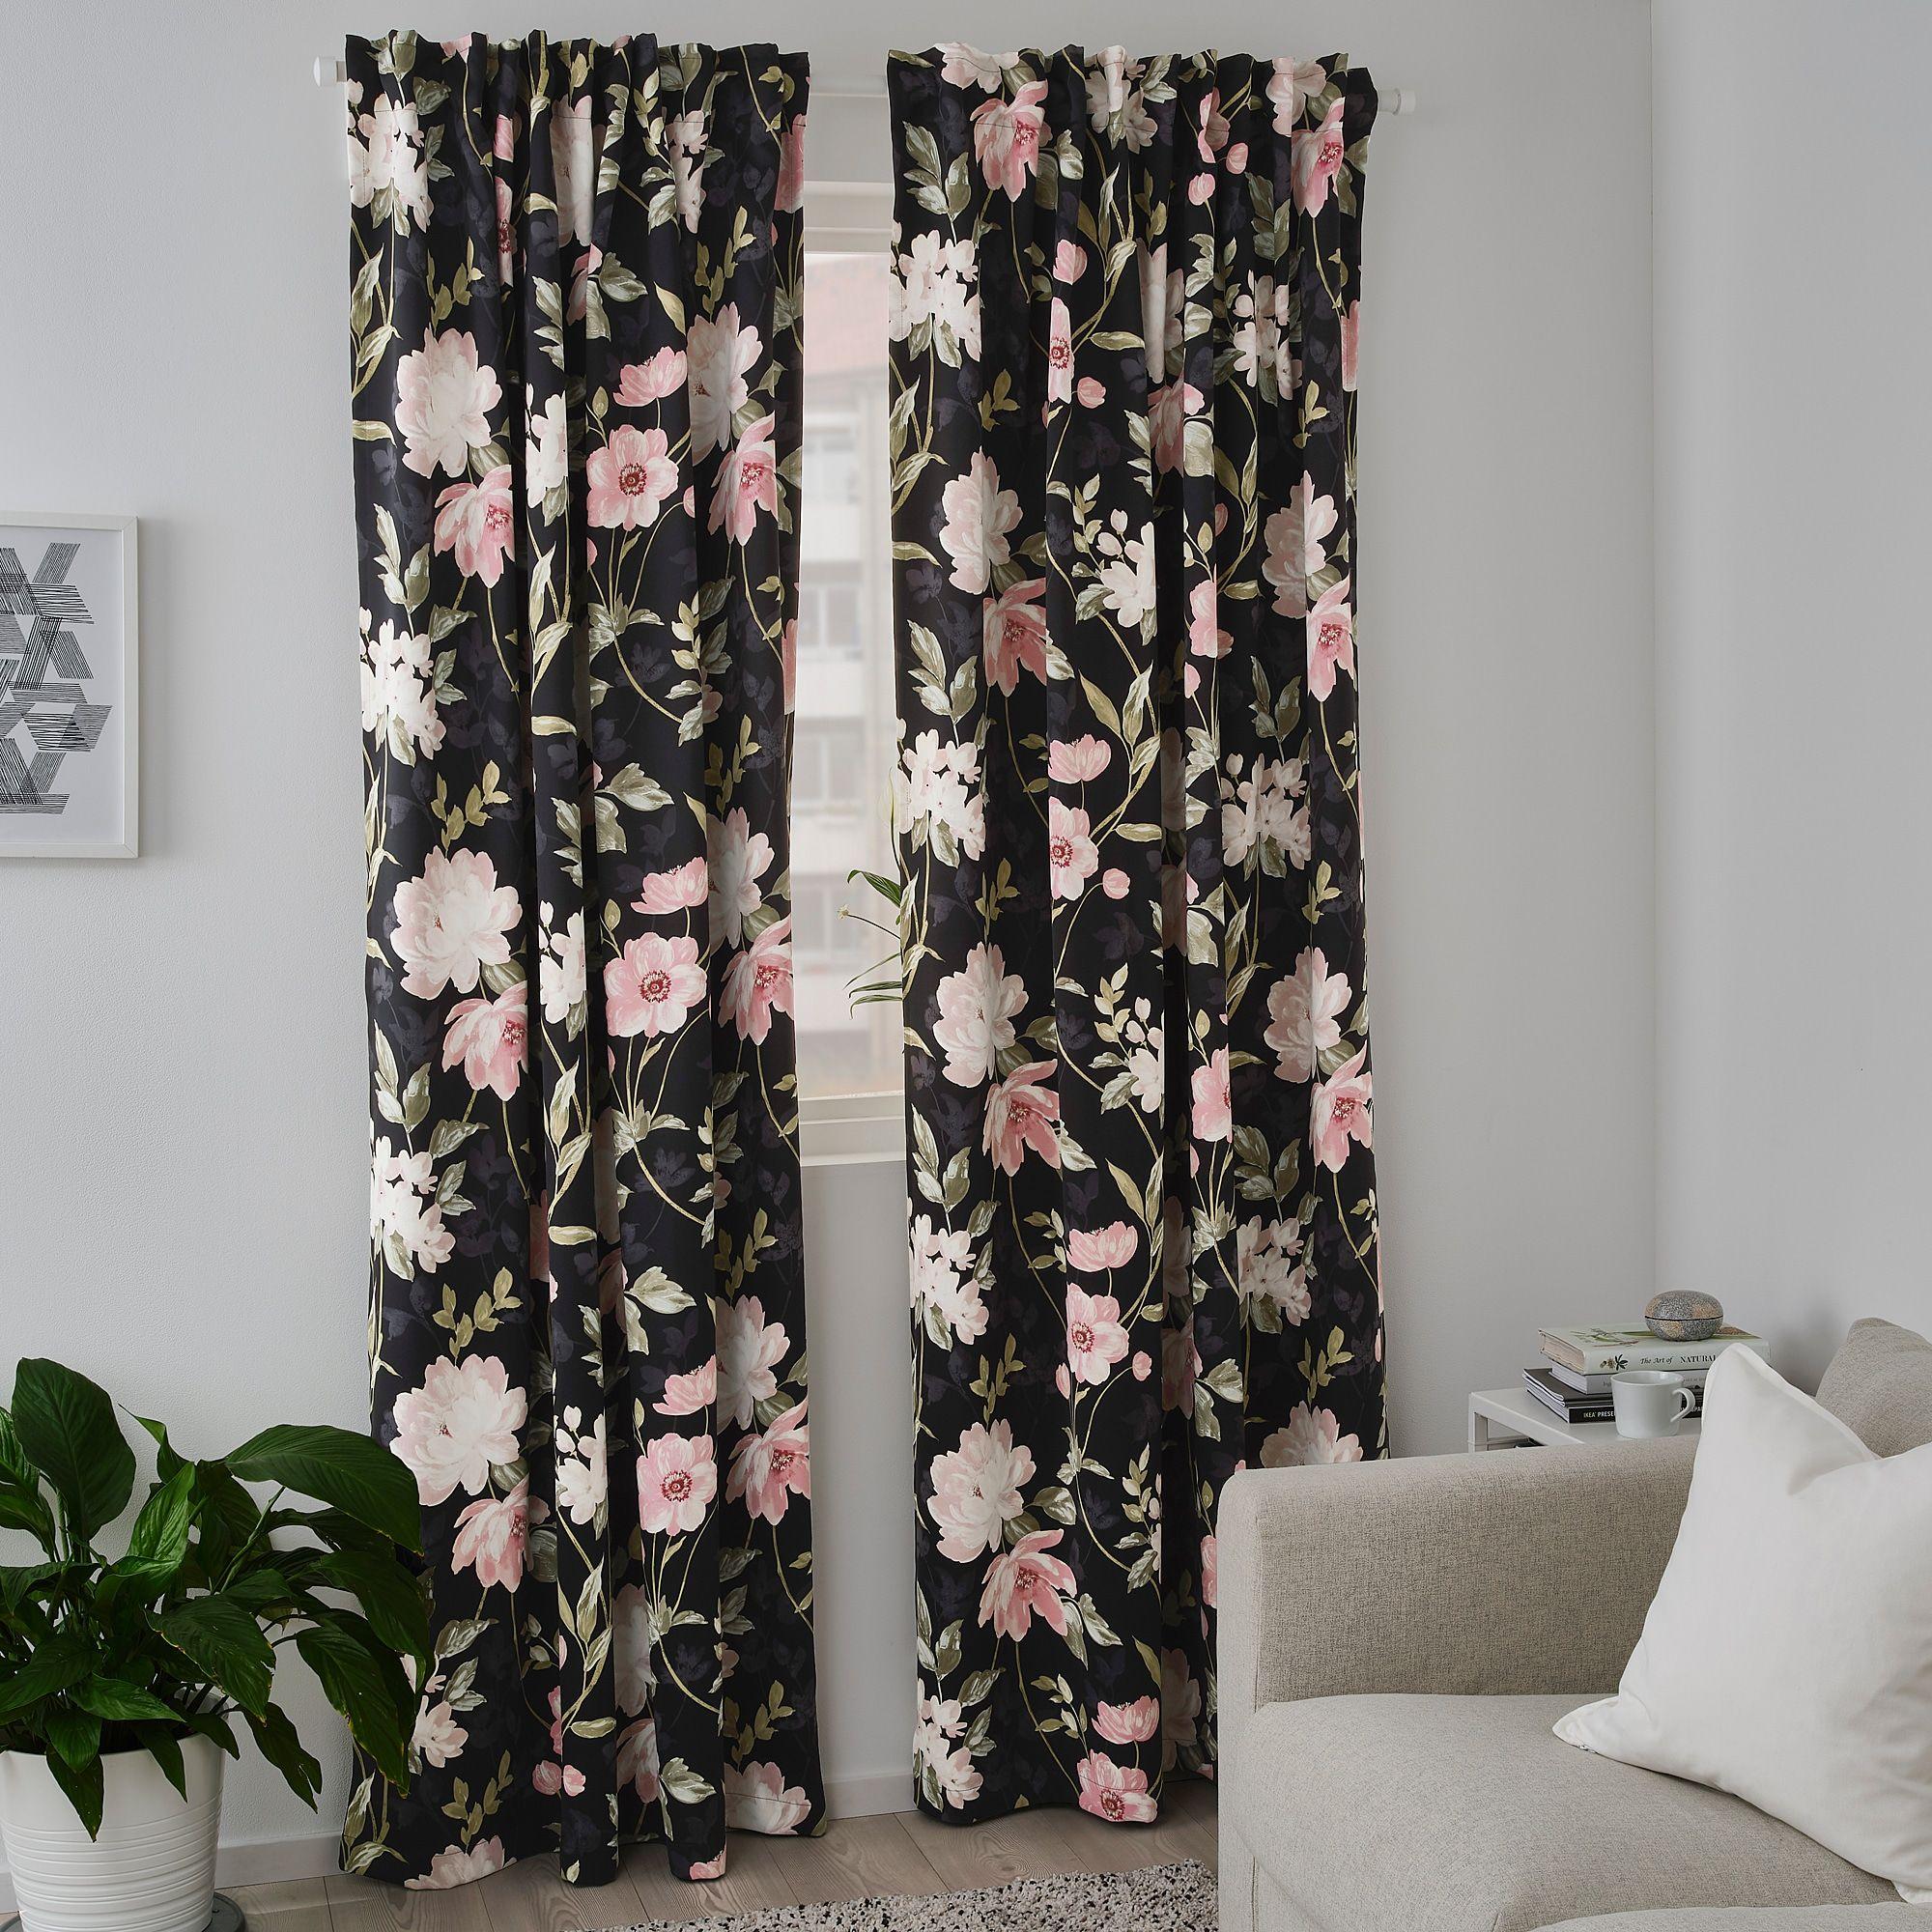 IKEA - ROSENMOTT Blackout curtains, 1 pair, Black/